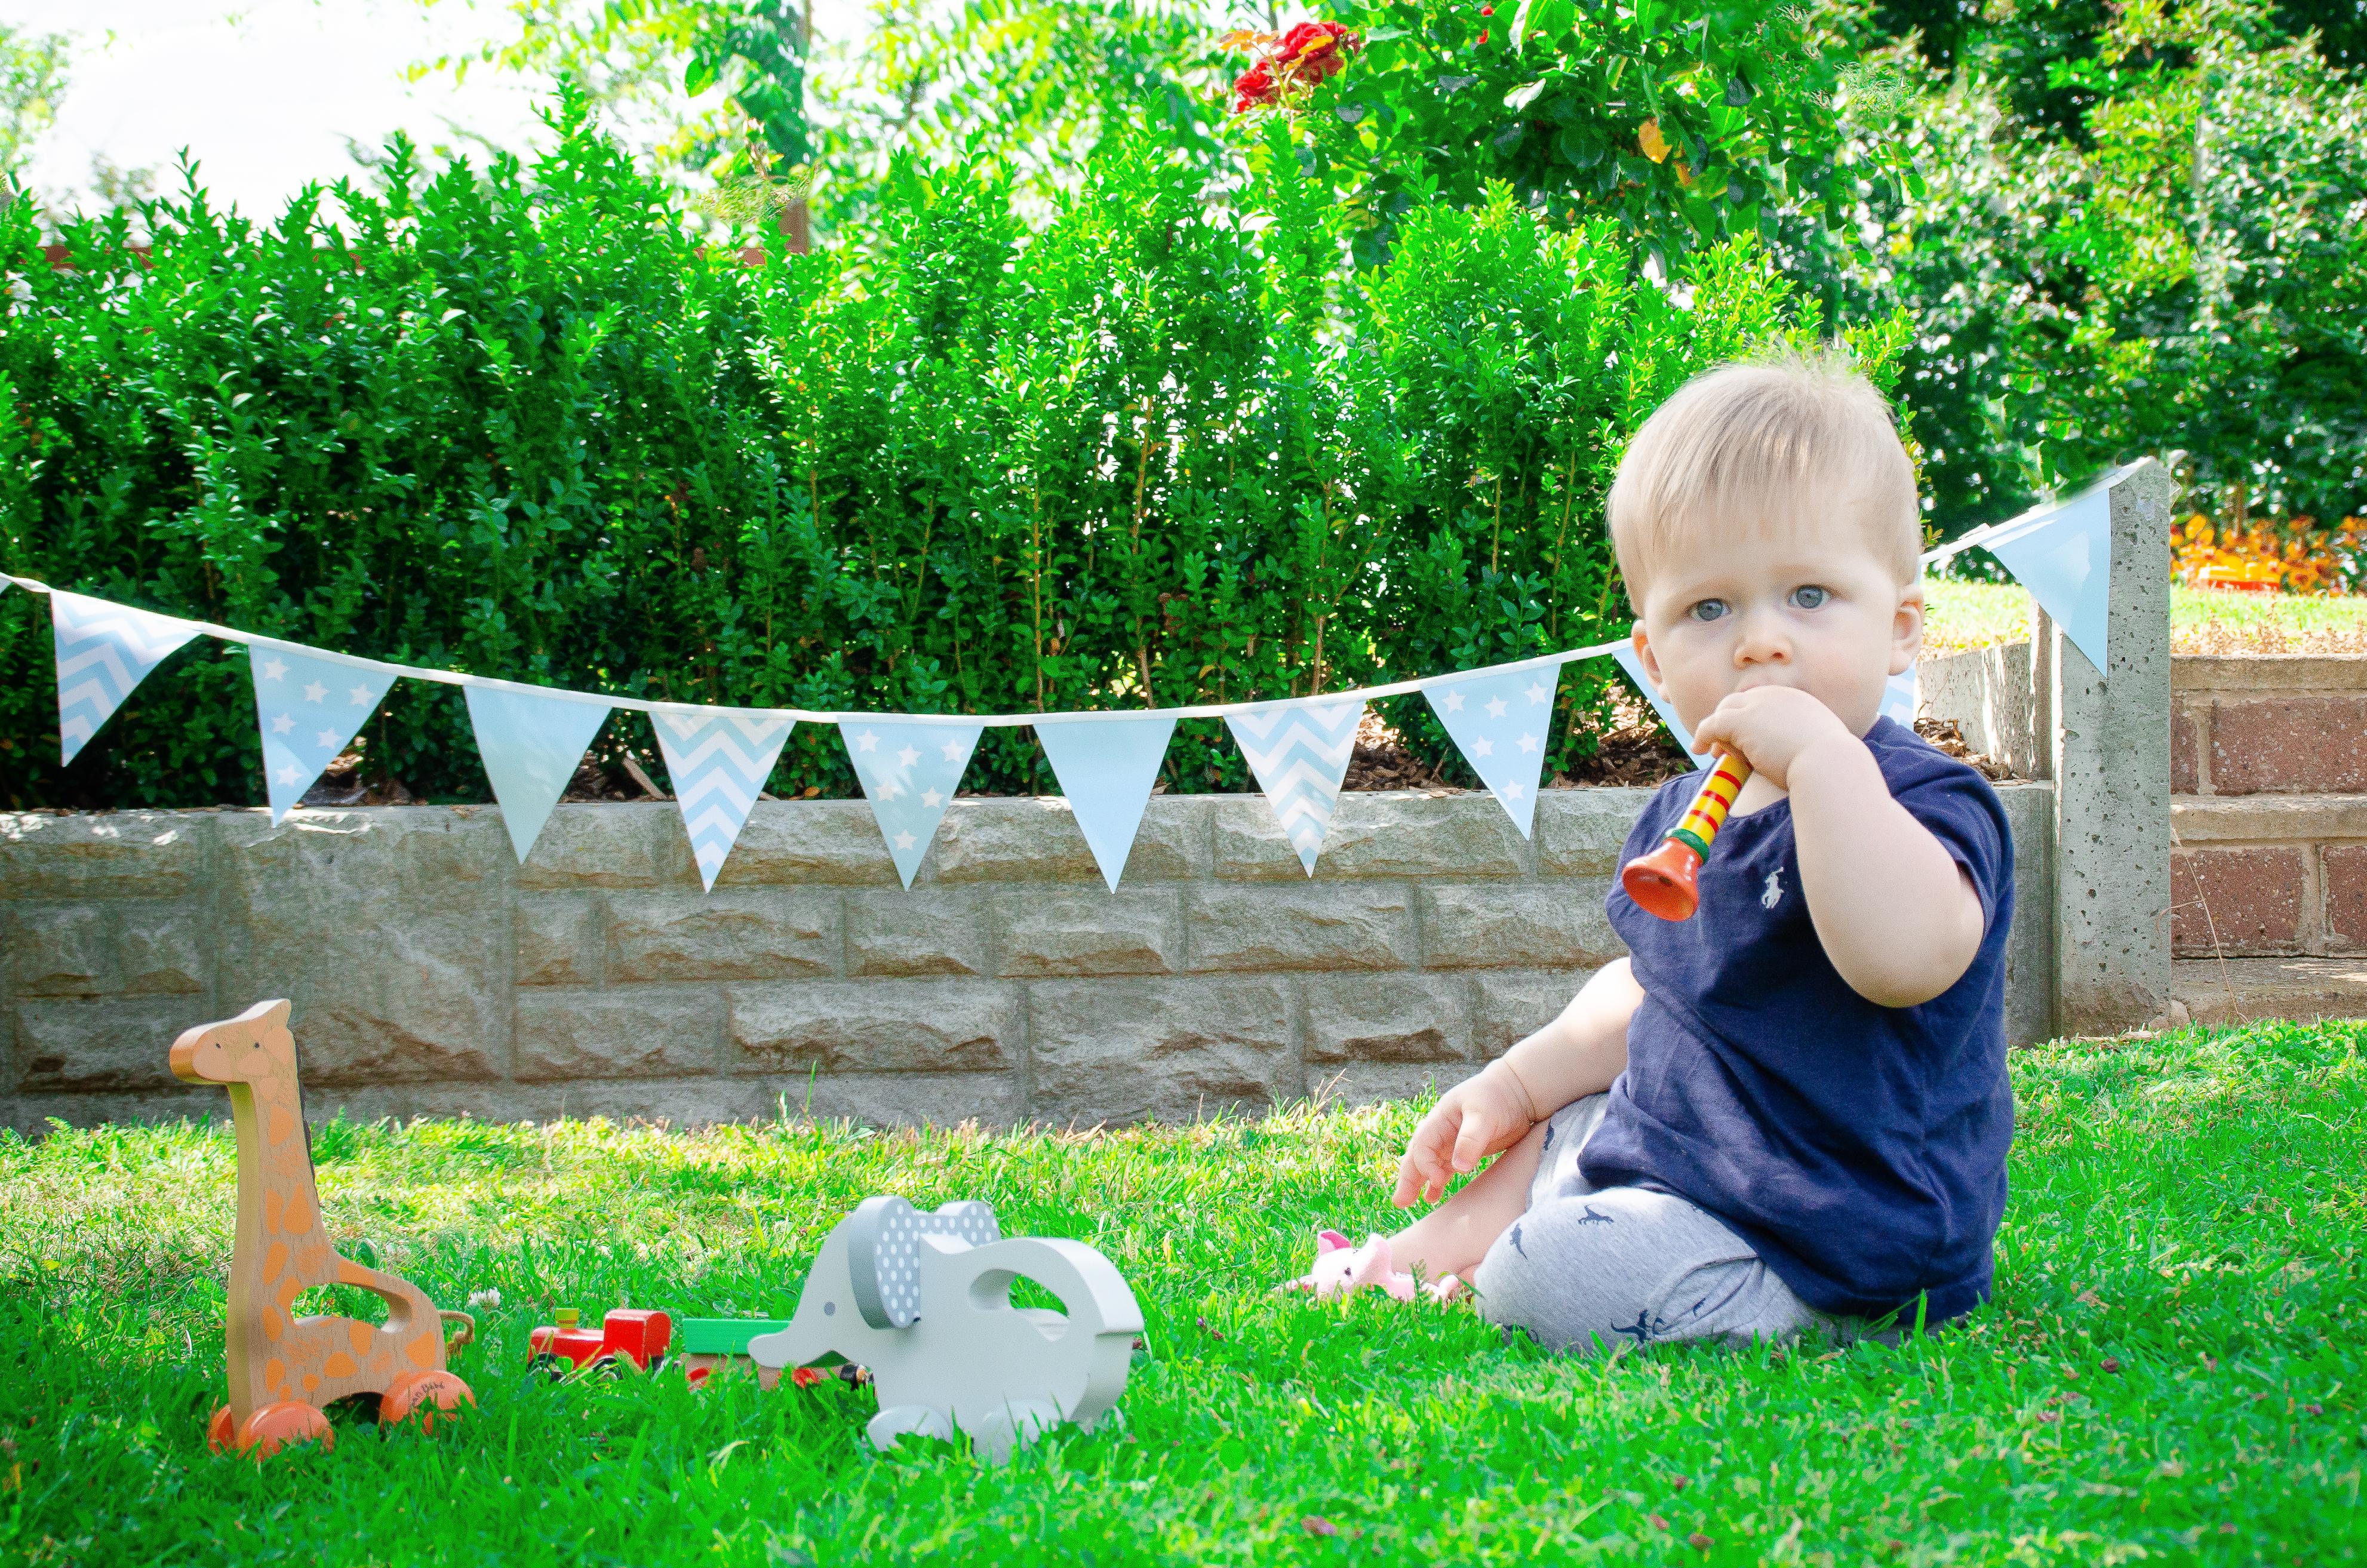 www.sarahfirkinsphotography.co